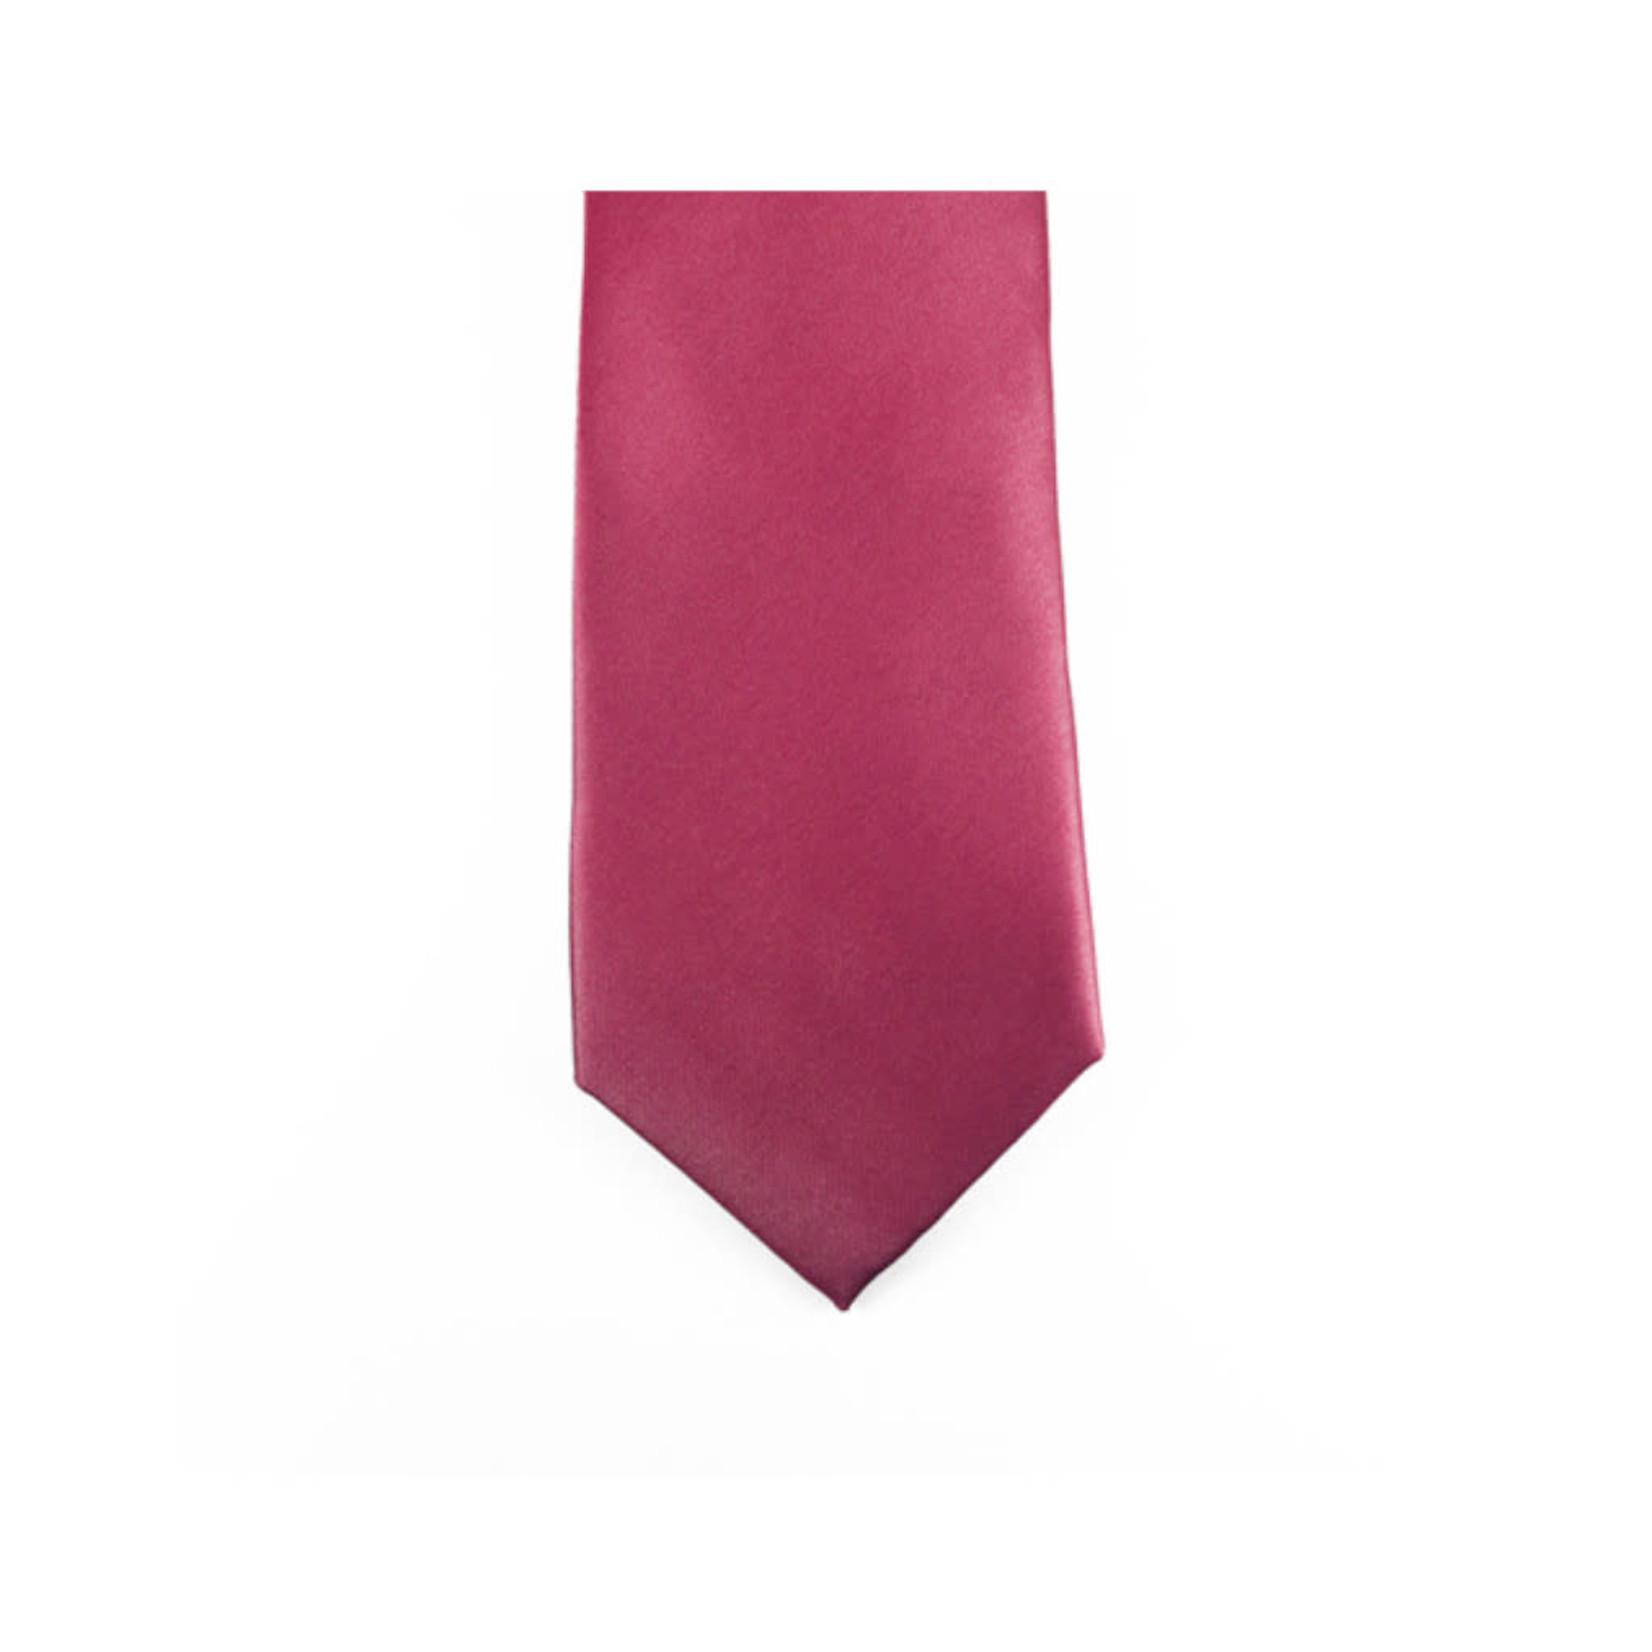 Knotz M100-59 Solid Dark Rose Tie